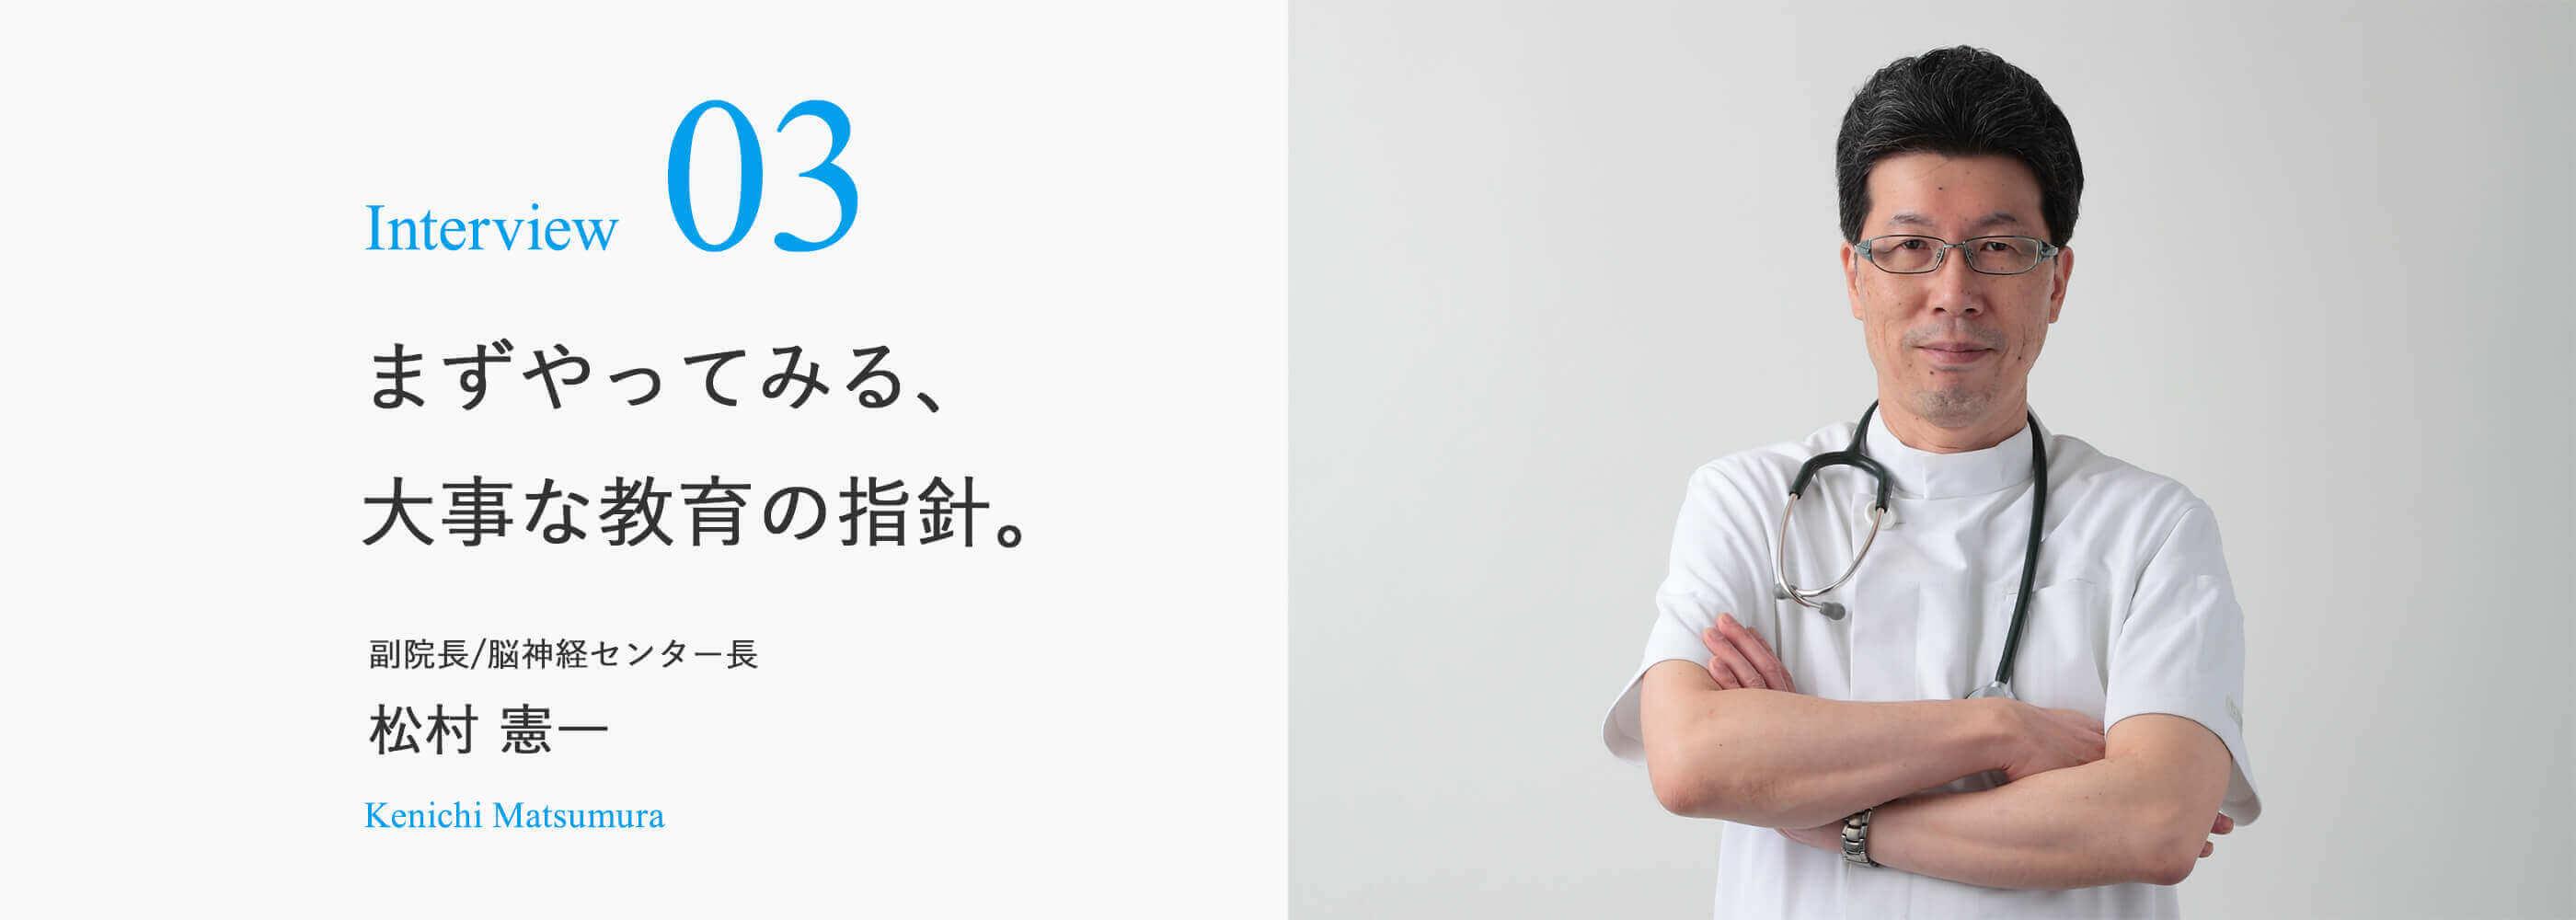 Interview 03 まずやってみる、大事な教育の指針。副院長/脳神経センター長 松村 憲一